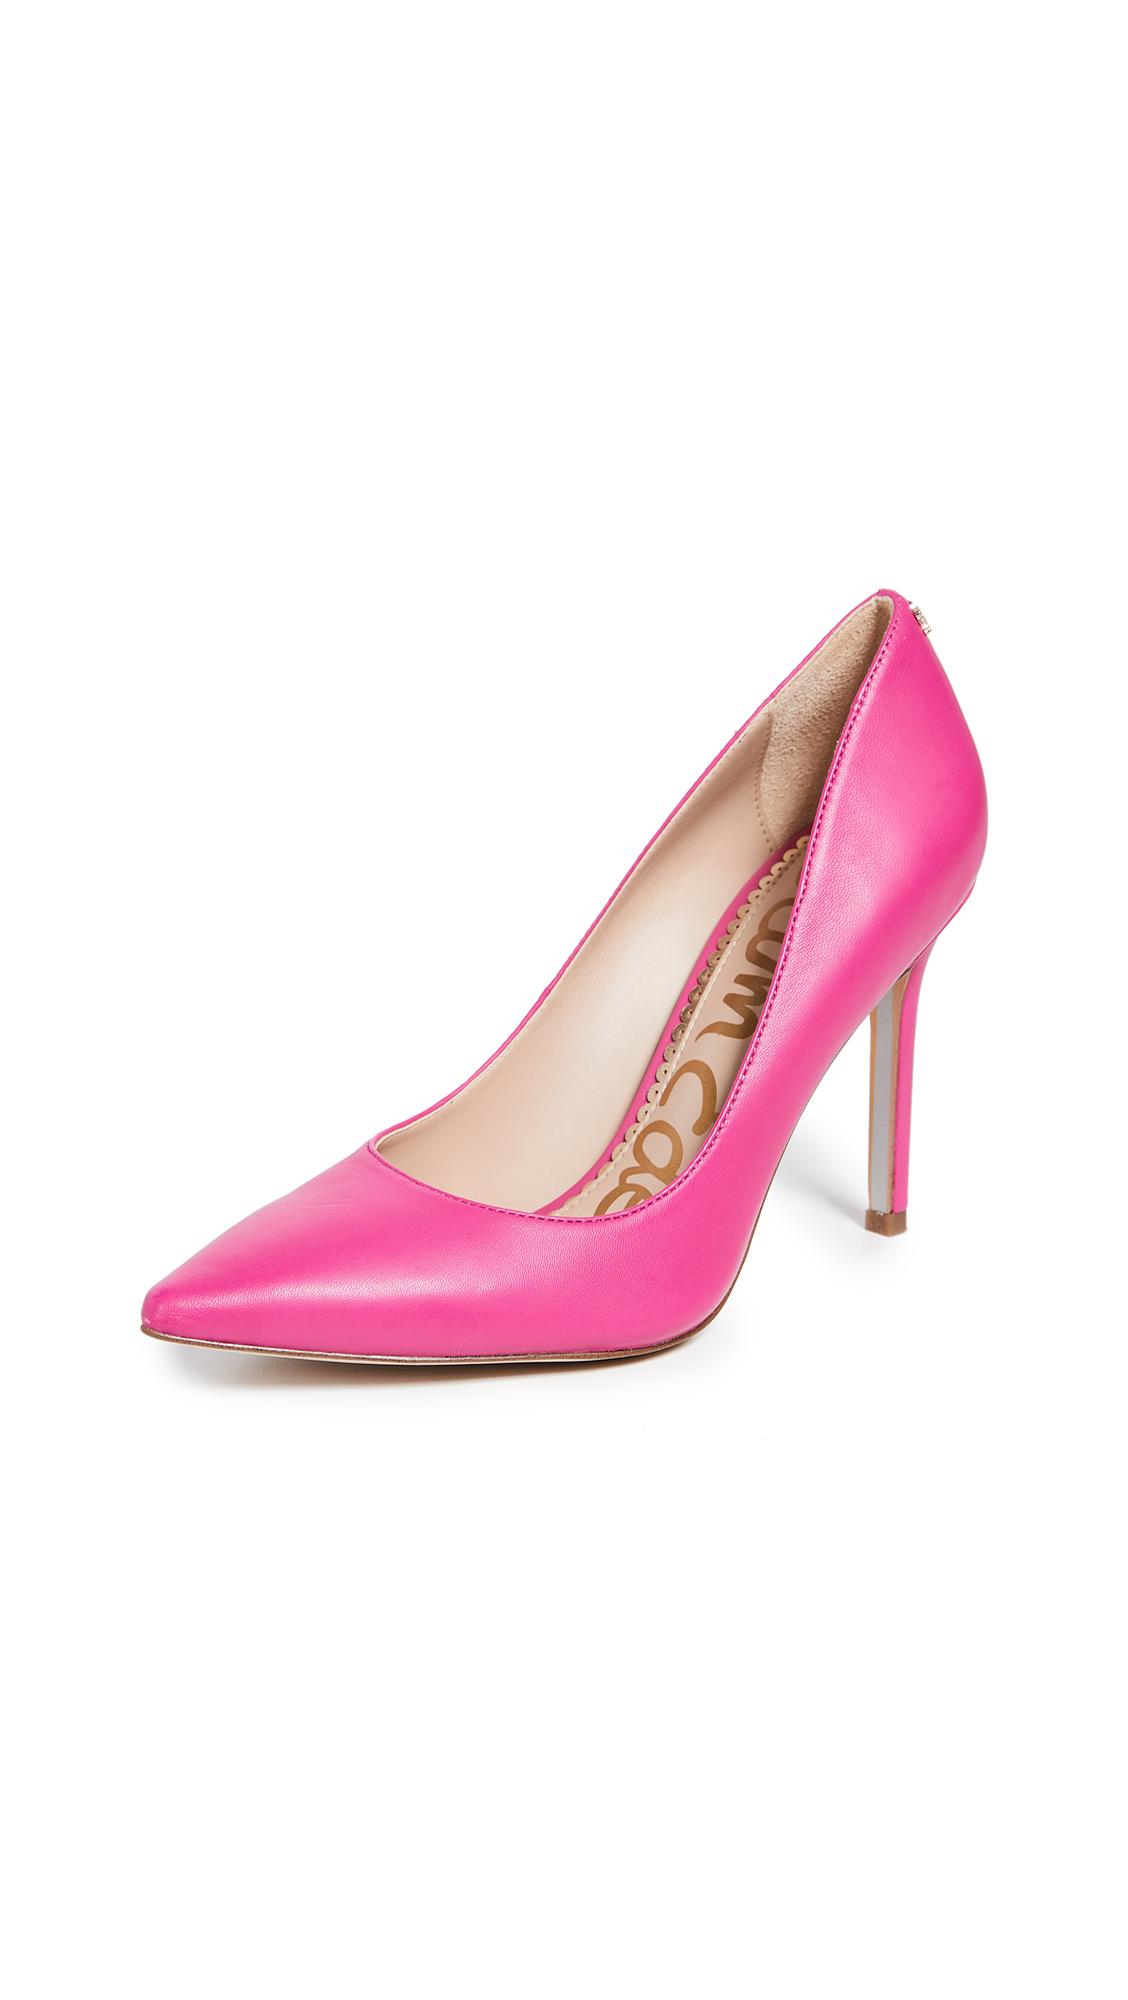 Sam Edelman Hazel Pumps - Pink Peony